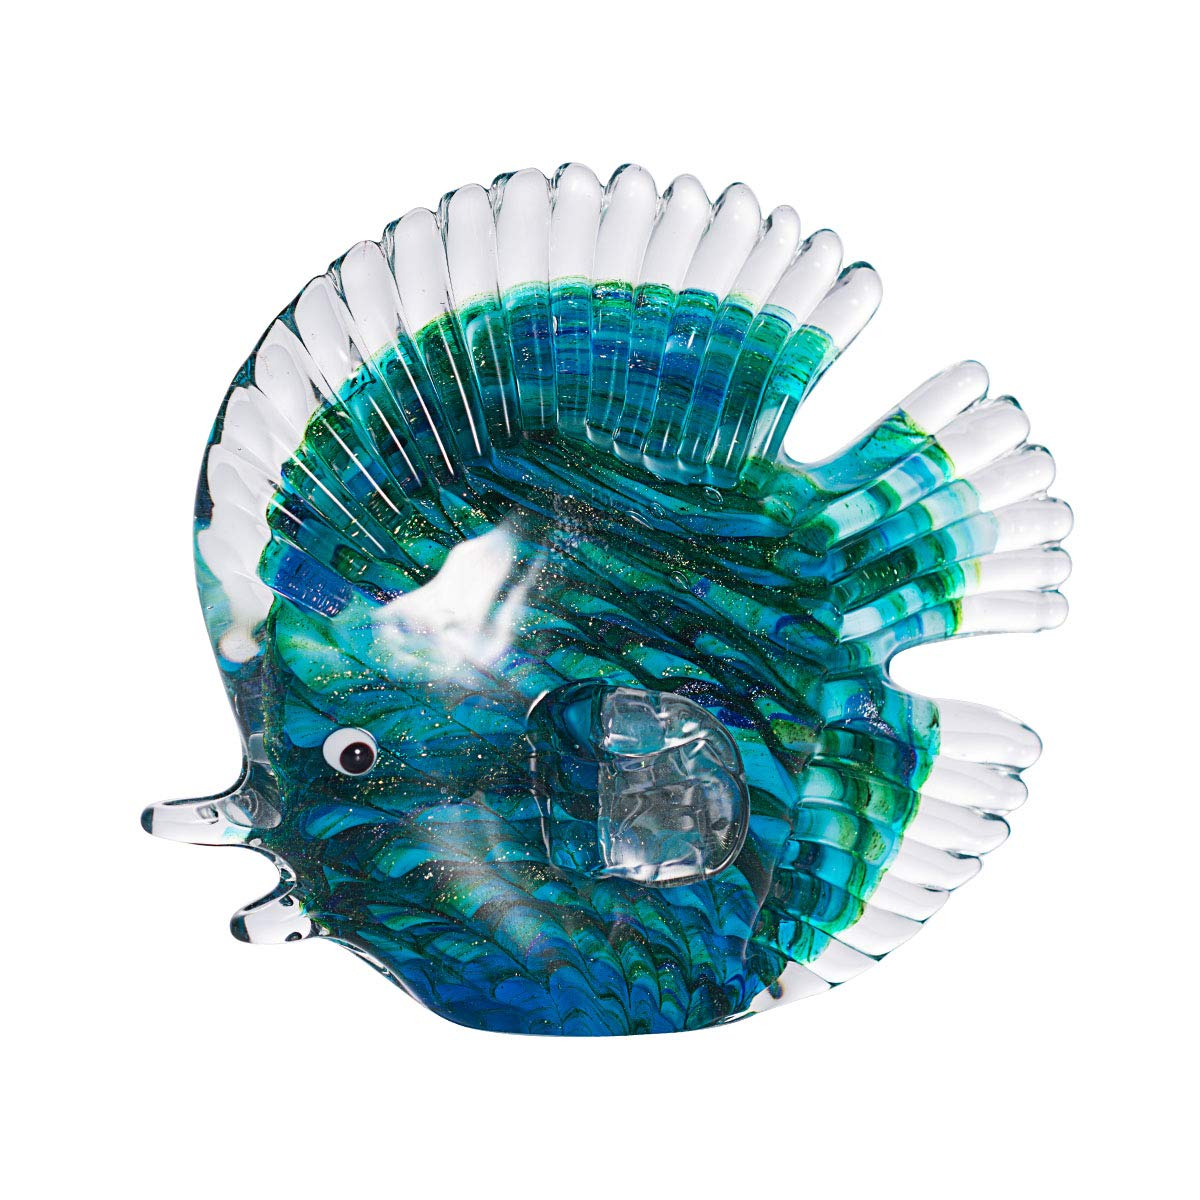 LONGWIN Handmade Glass Stripe Tropical Fish Sculpture Glass Hand Blown Sea Animal Figurine Home Tabletop Decoration Ornaments